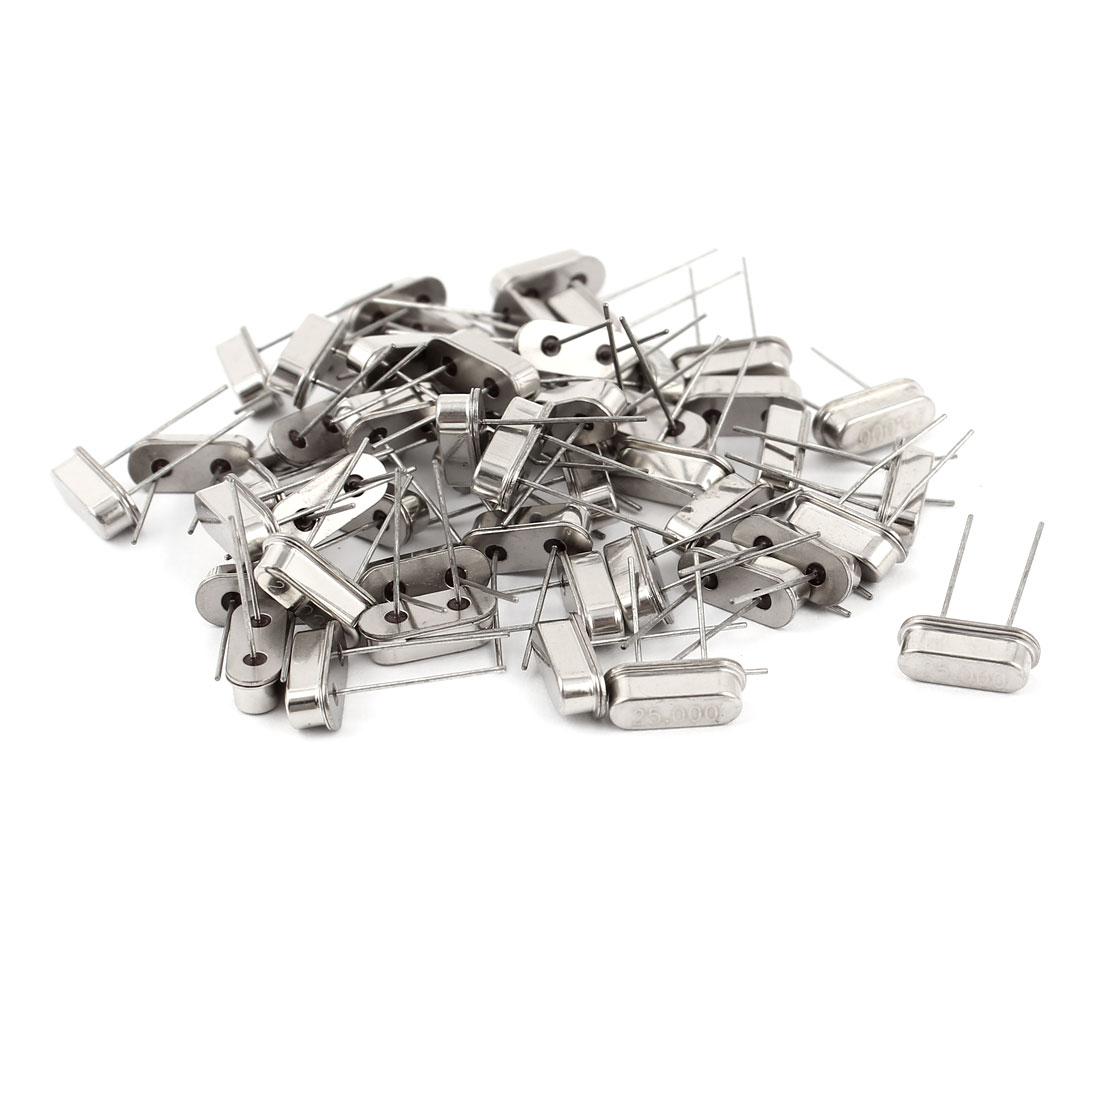 50 Pcs HC-49S 25MHz Low Profile Quartz Crystal Oscillators Silver Tone